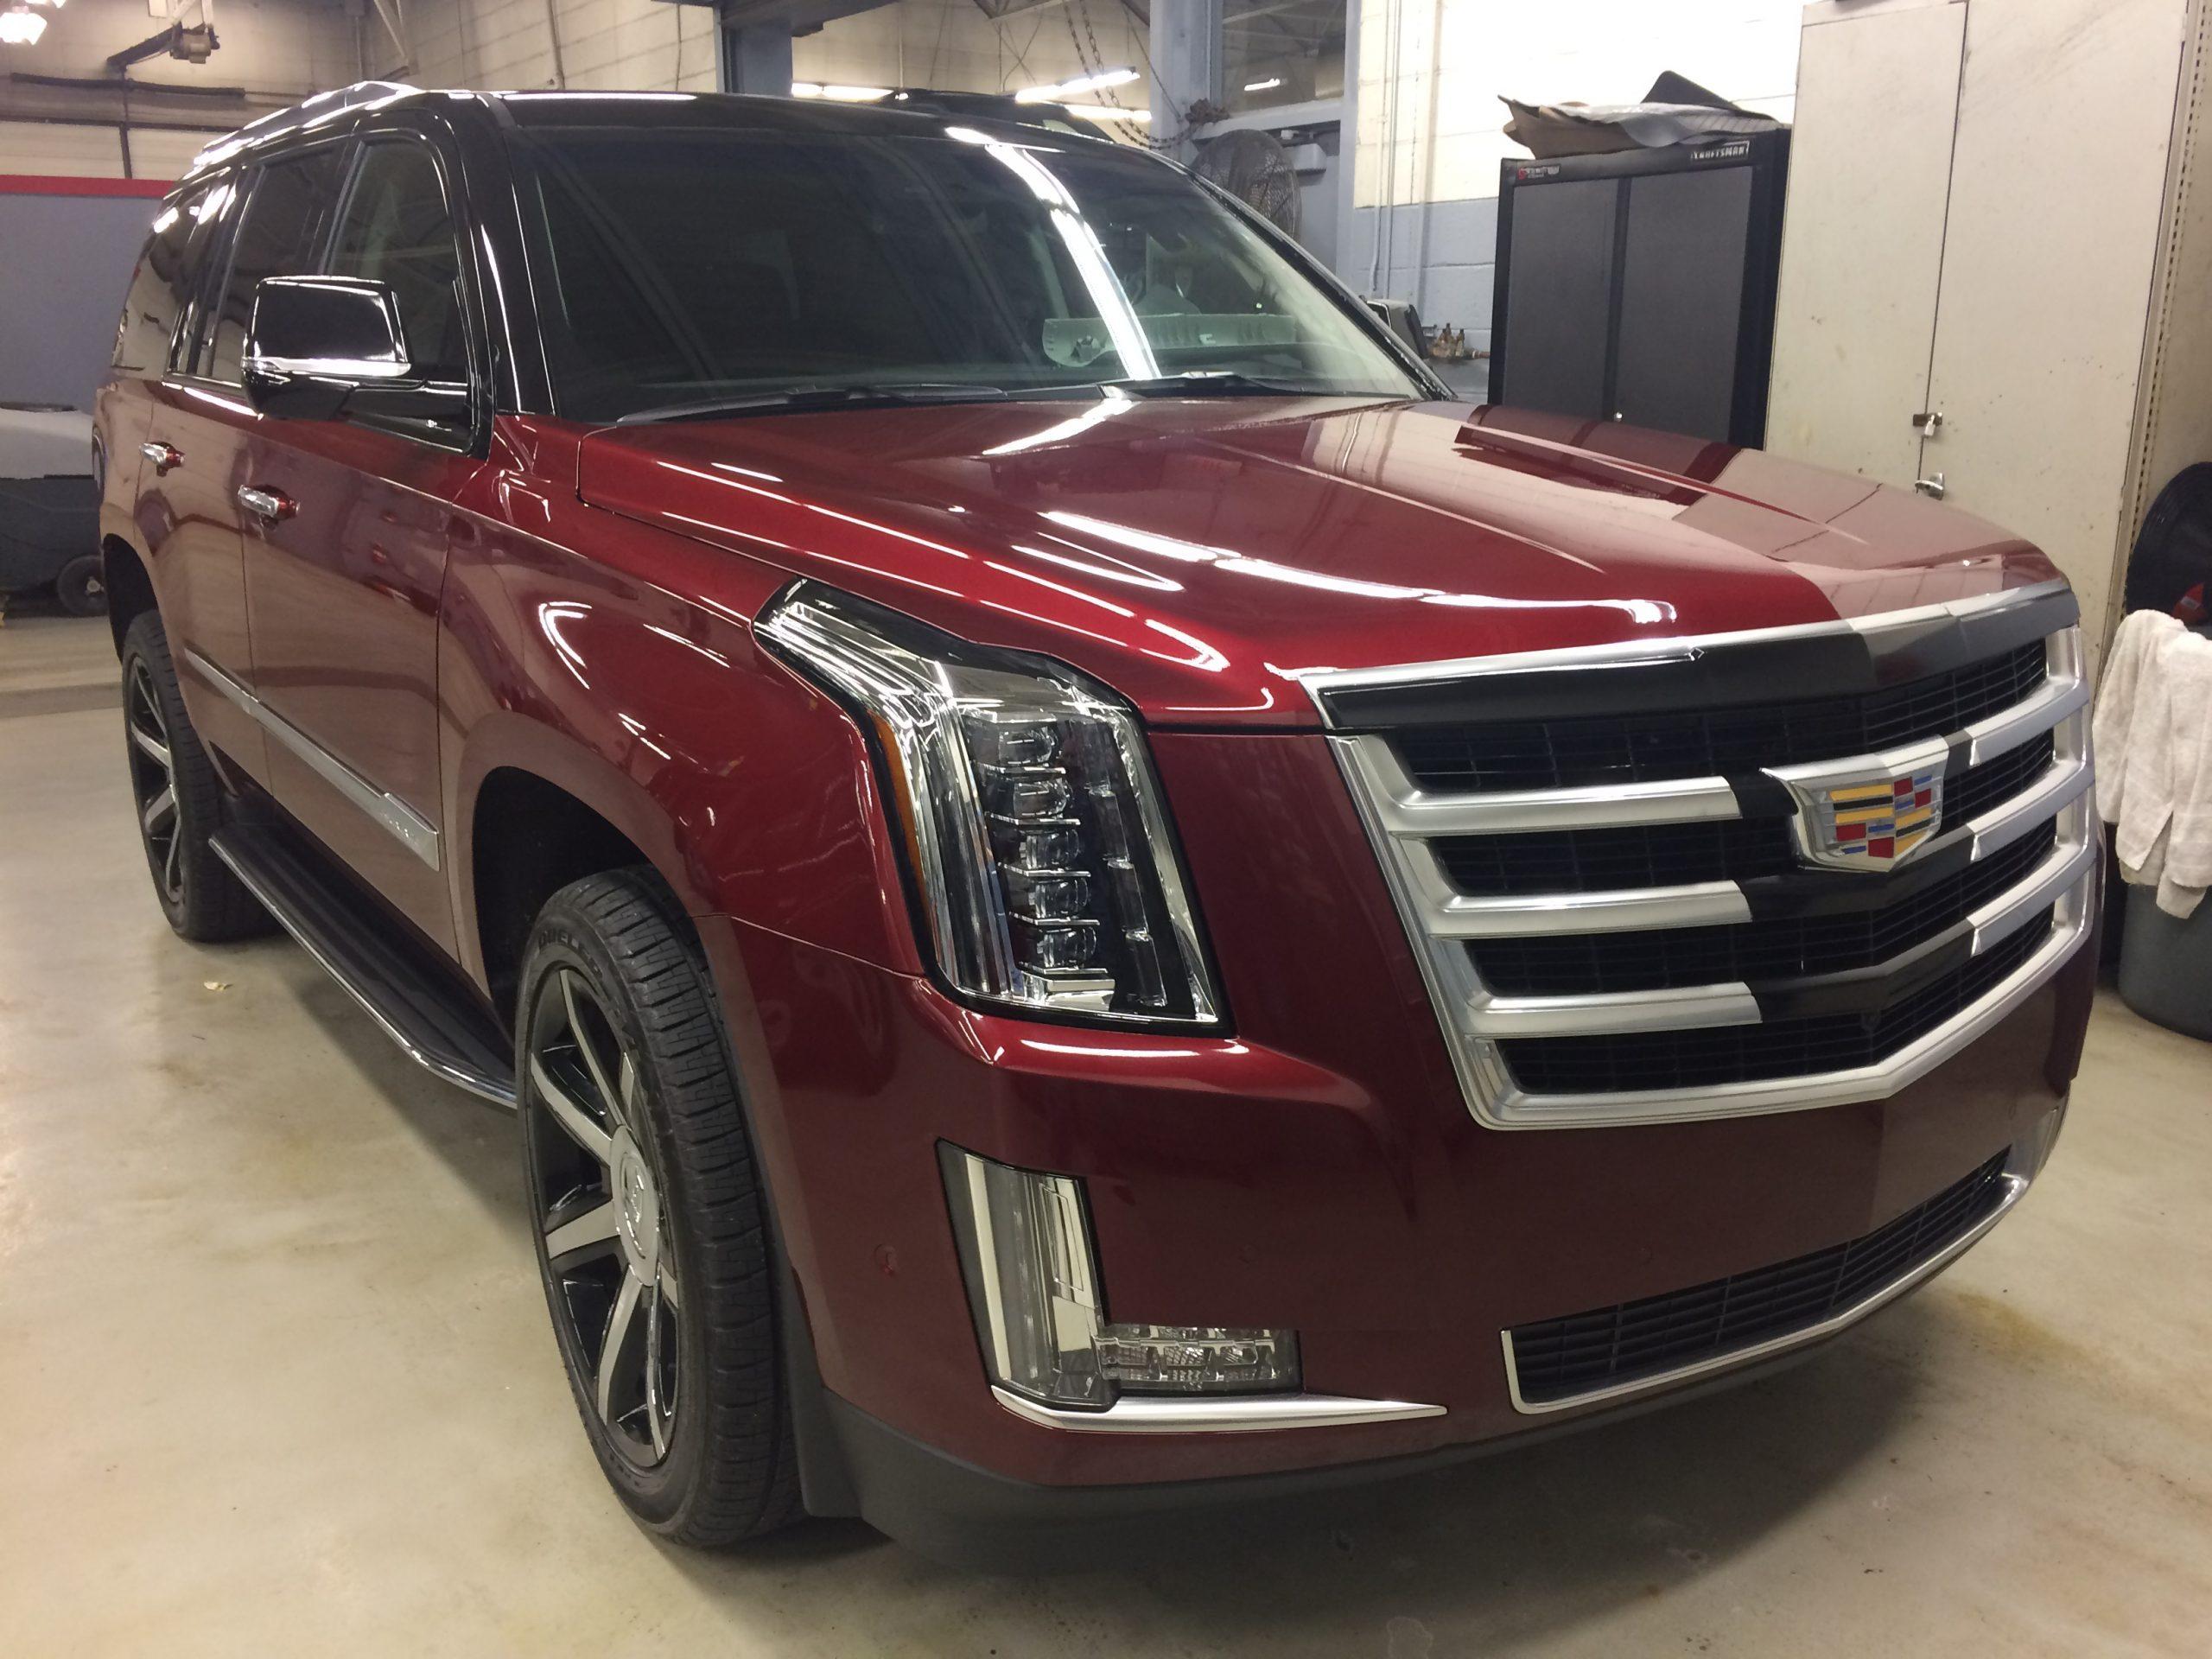 Cadillac Escalade - after